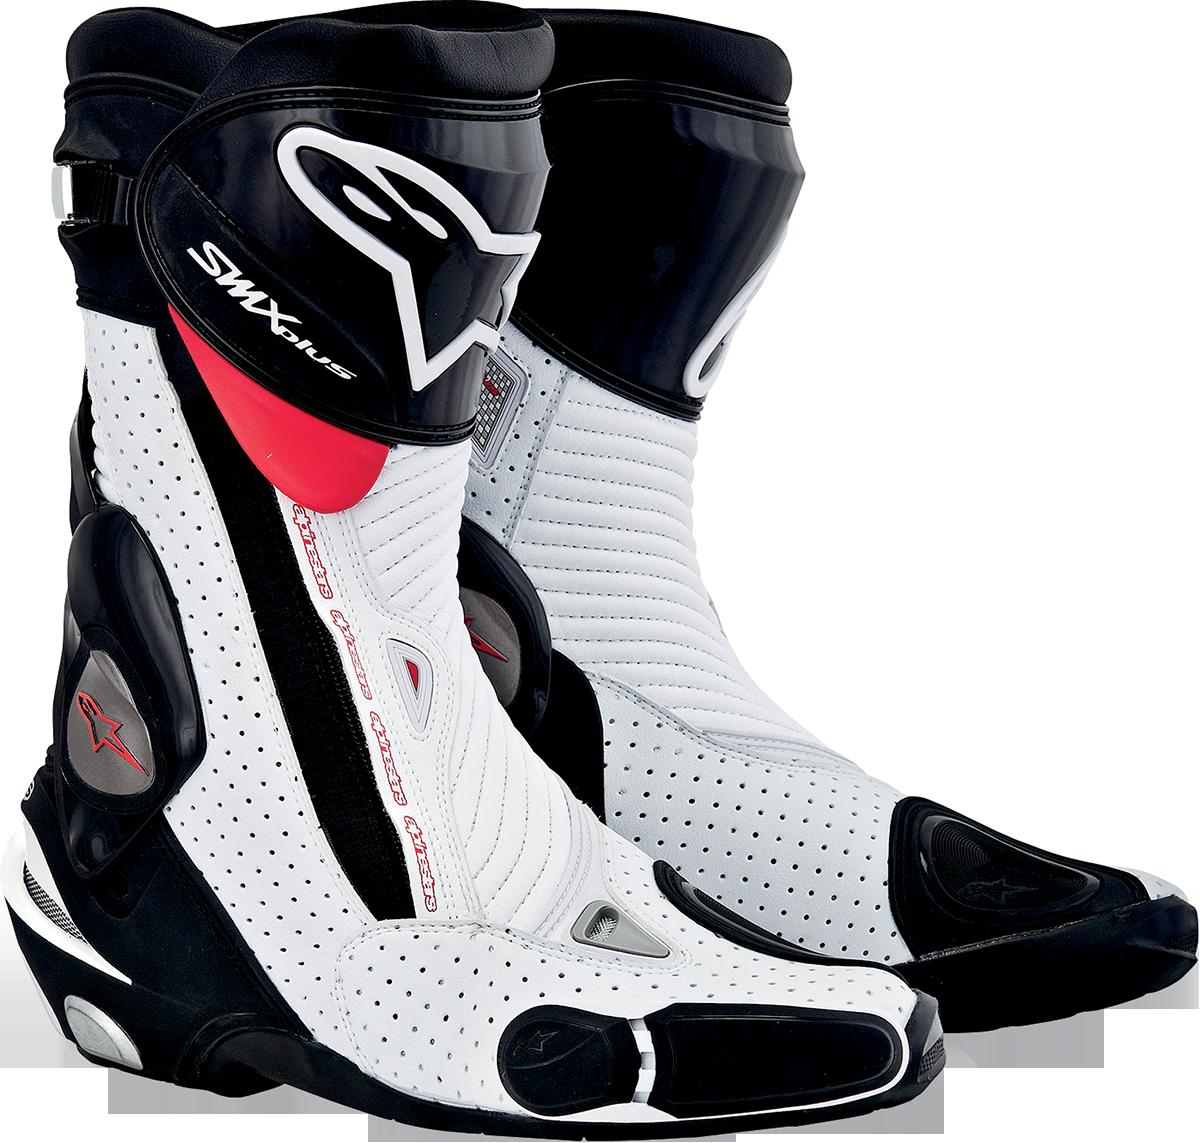 alpinestars smx plus vented motorcycle boot black white red. Black Bedroom Furniture Sets. Home Design Ideas